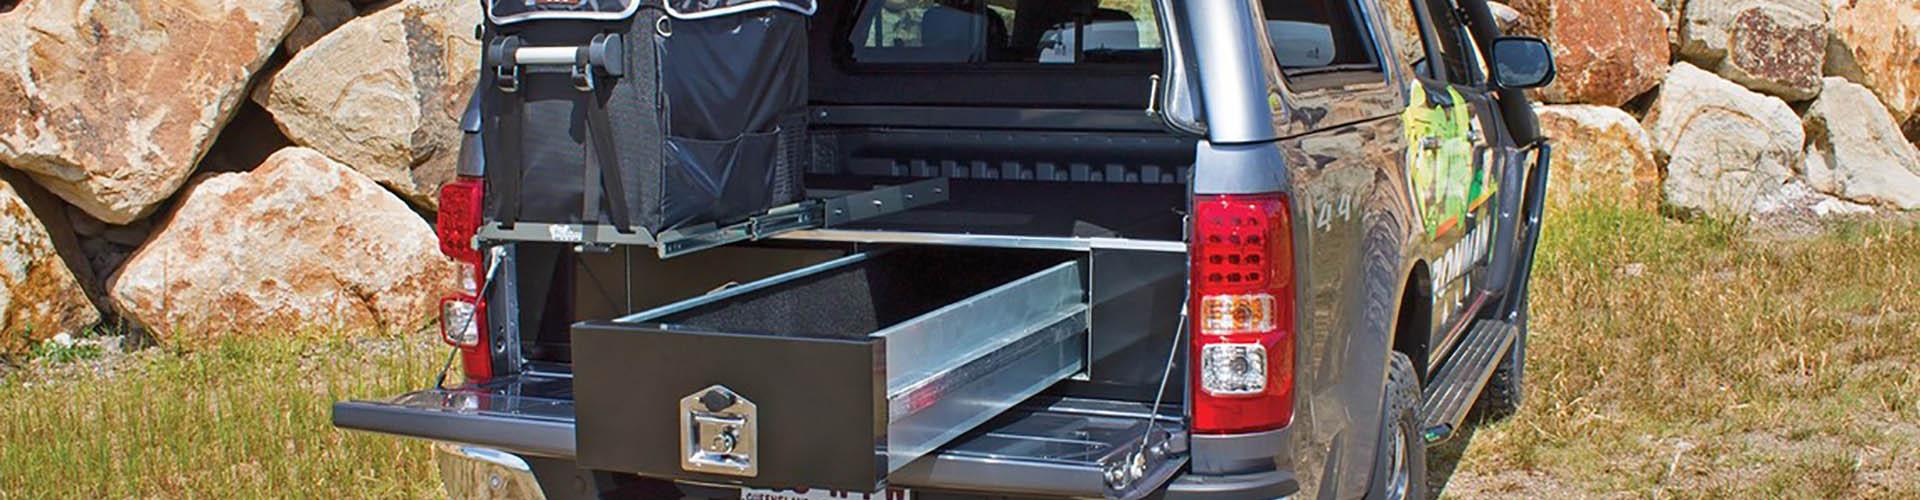 Locksafe Drawer Systems